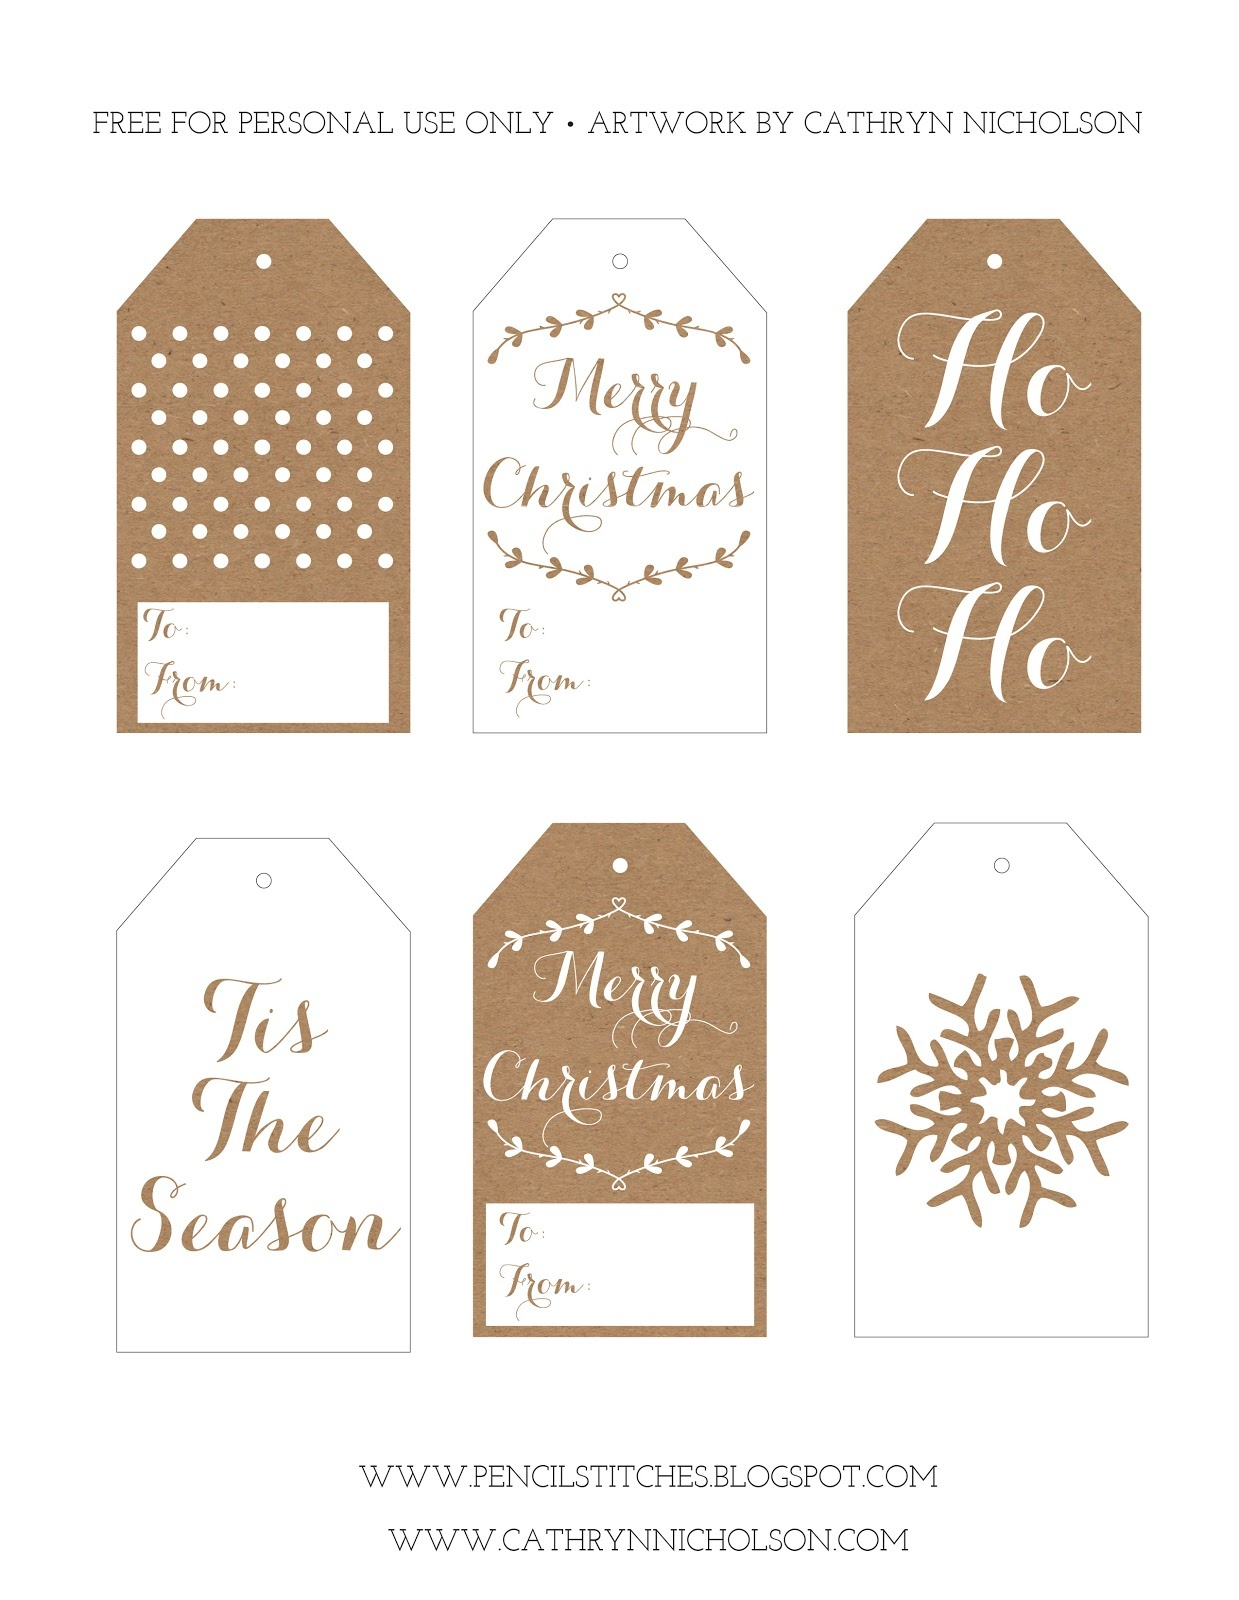 Pencil Stitches: Free Printable Christmas Gift Tags - Free Printable Christmas Gift Tags